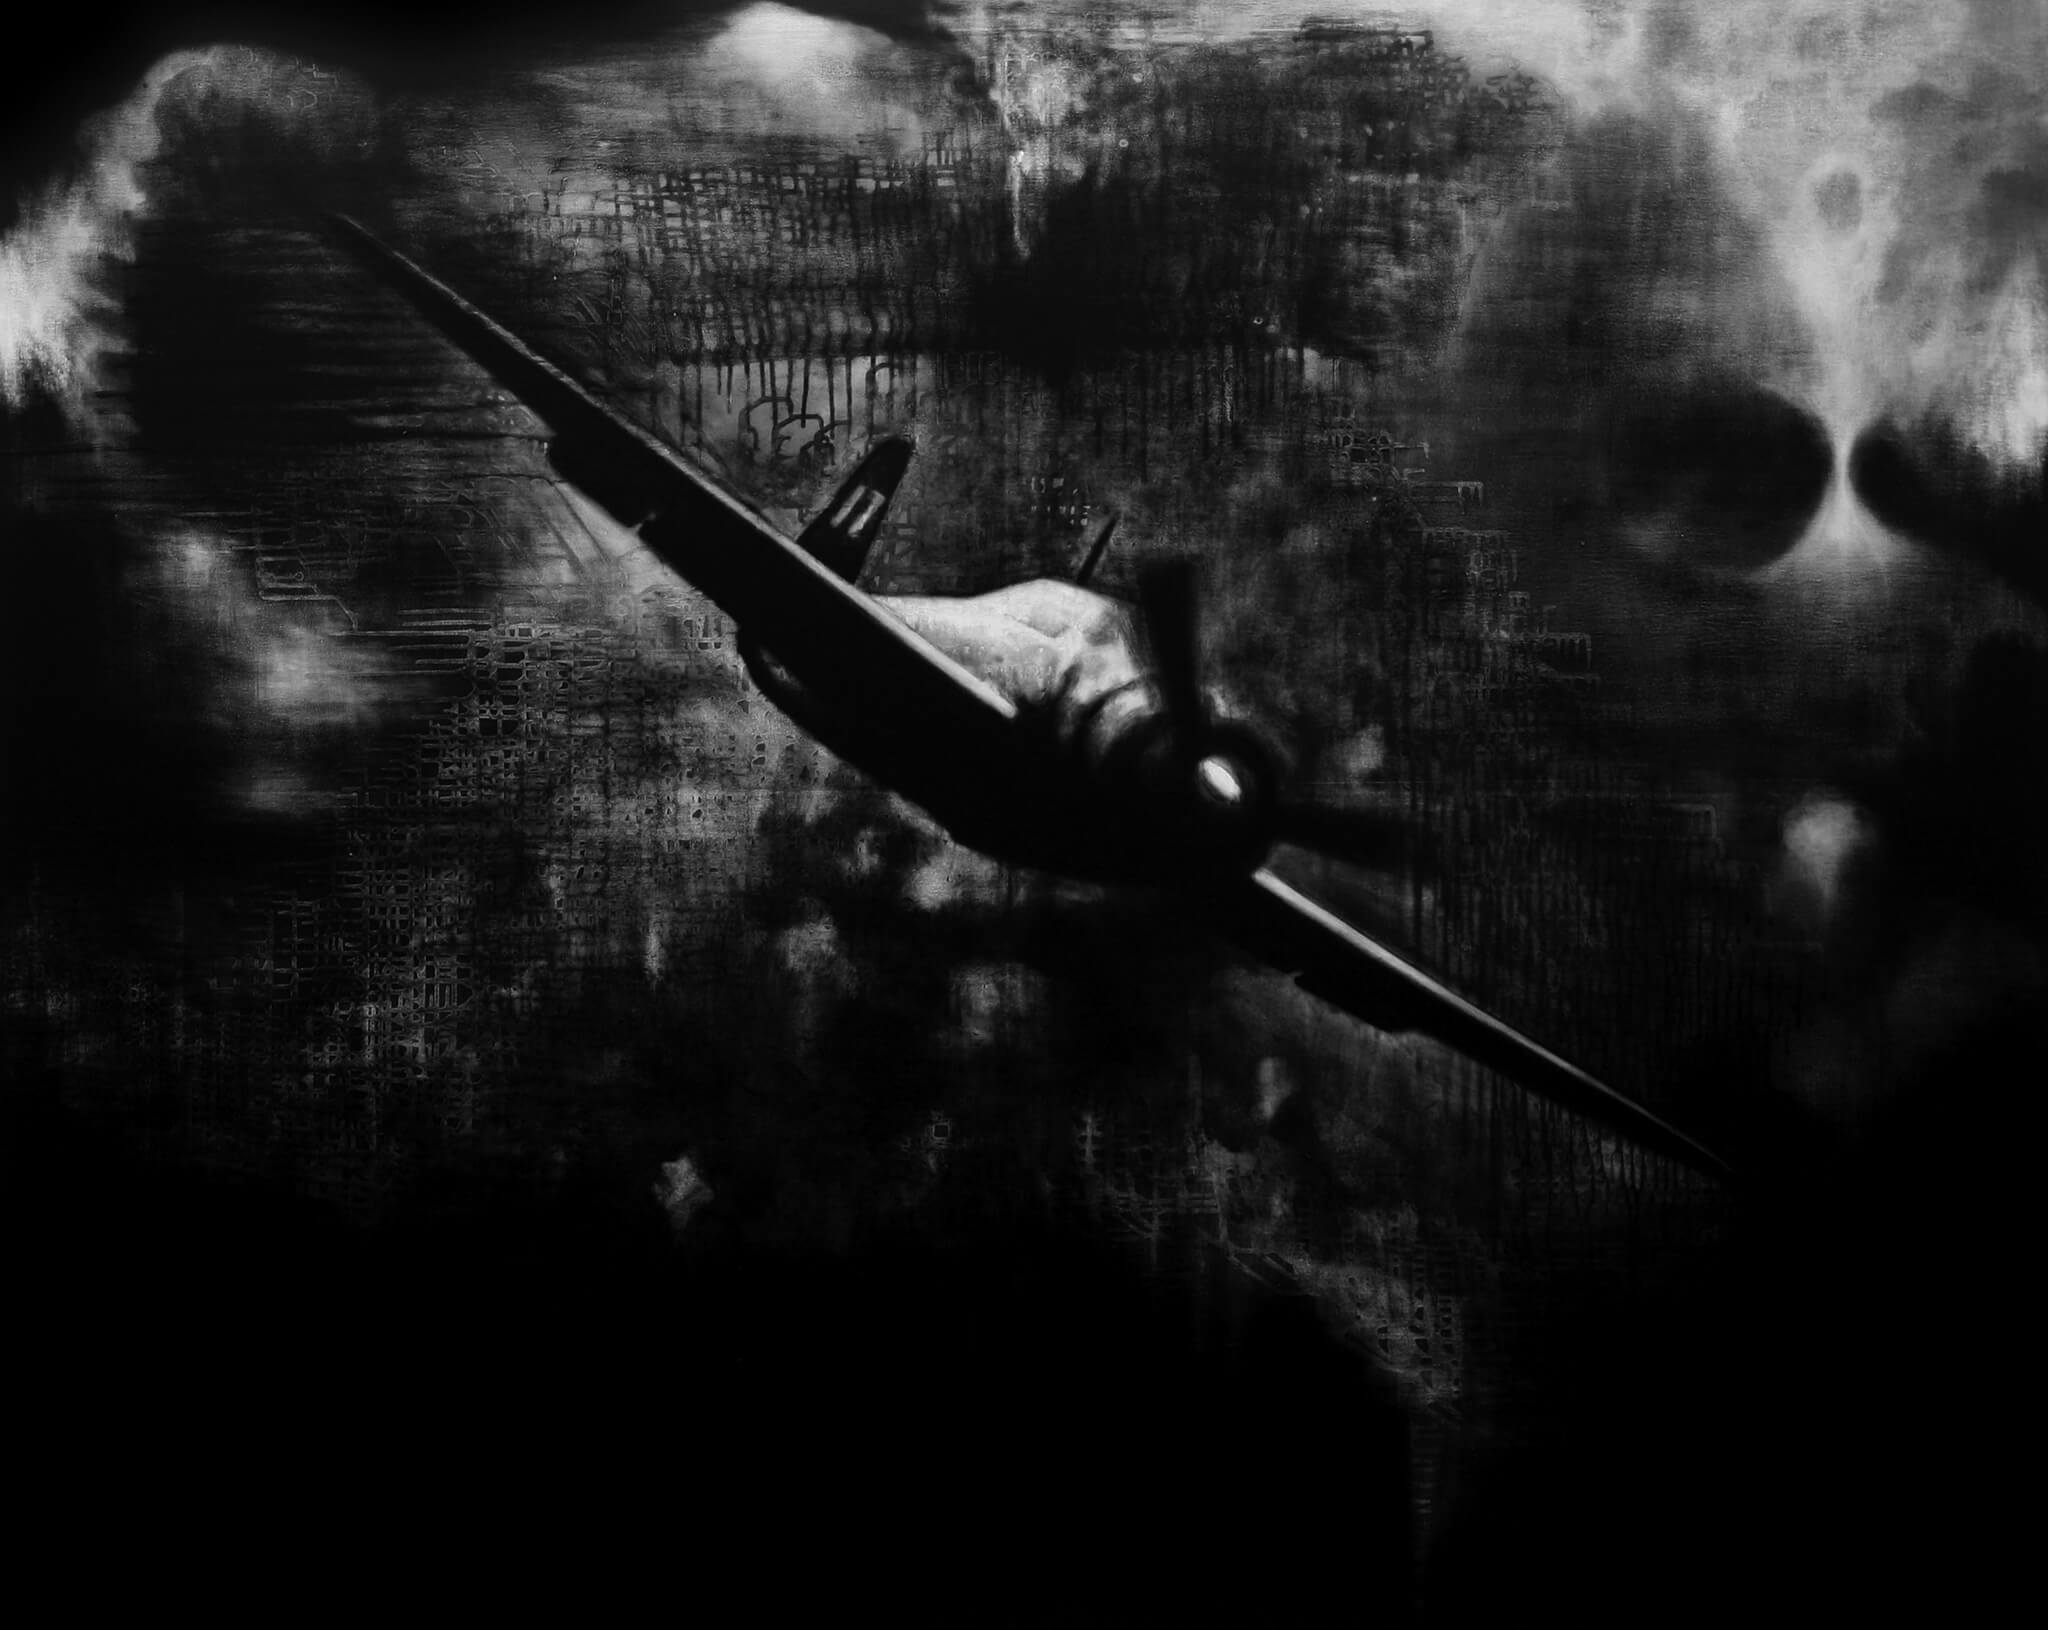 Kamikaze III, 2010